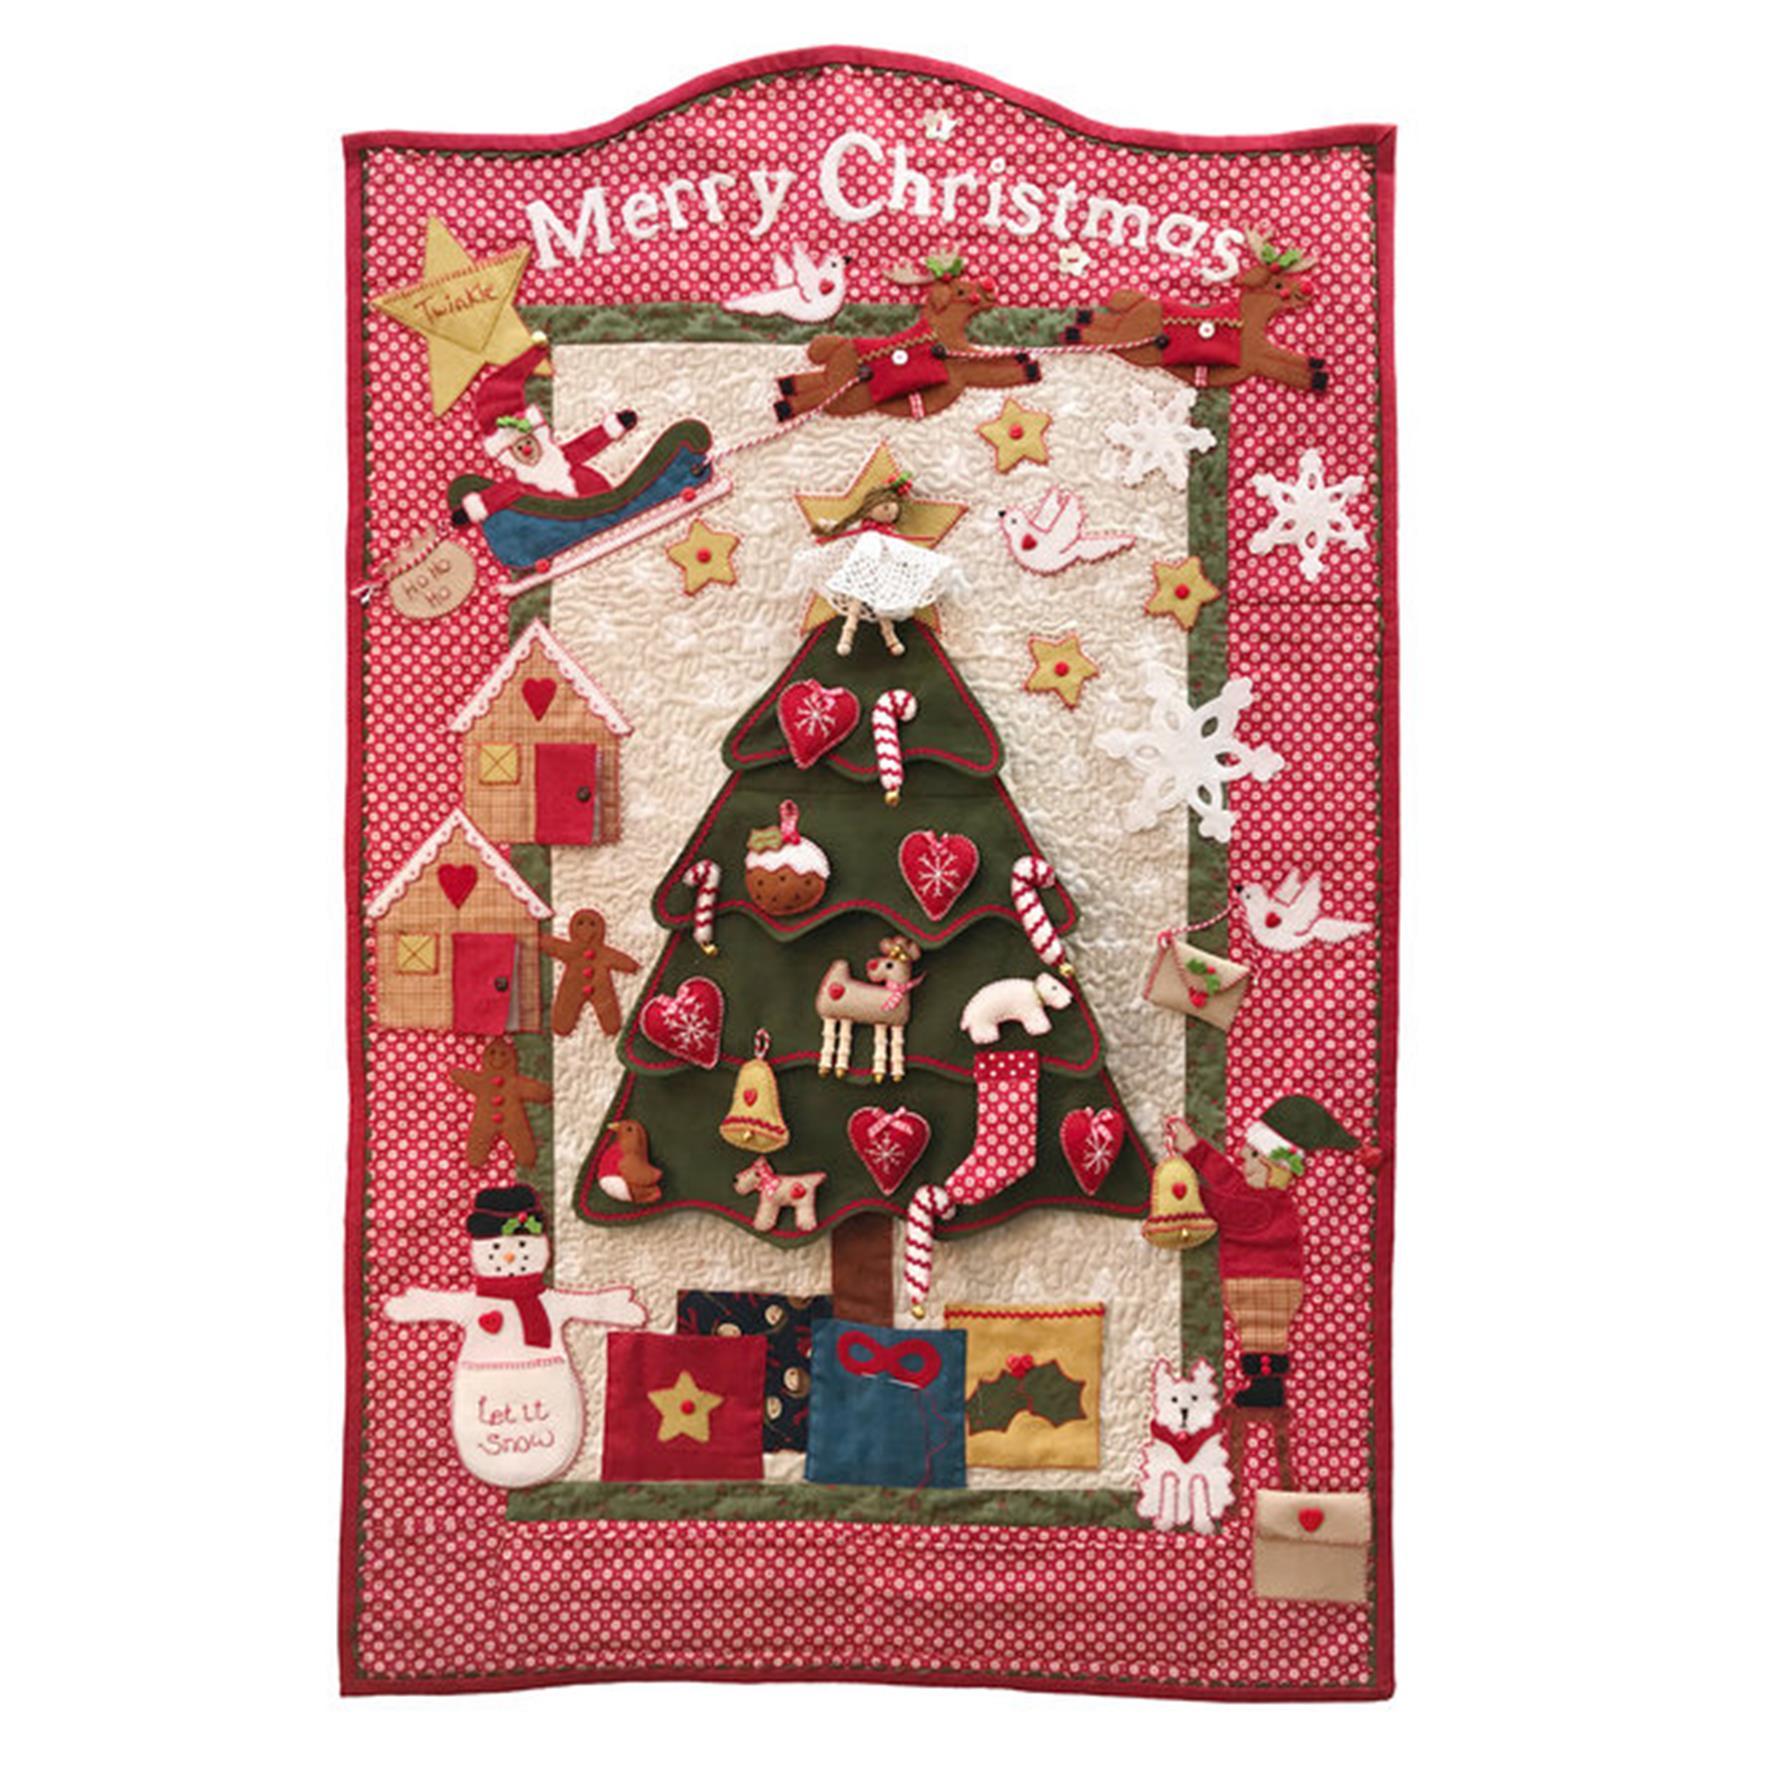 Christmas Tree Advent Calendar Pattern Designed By Mandy